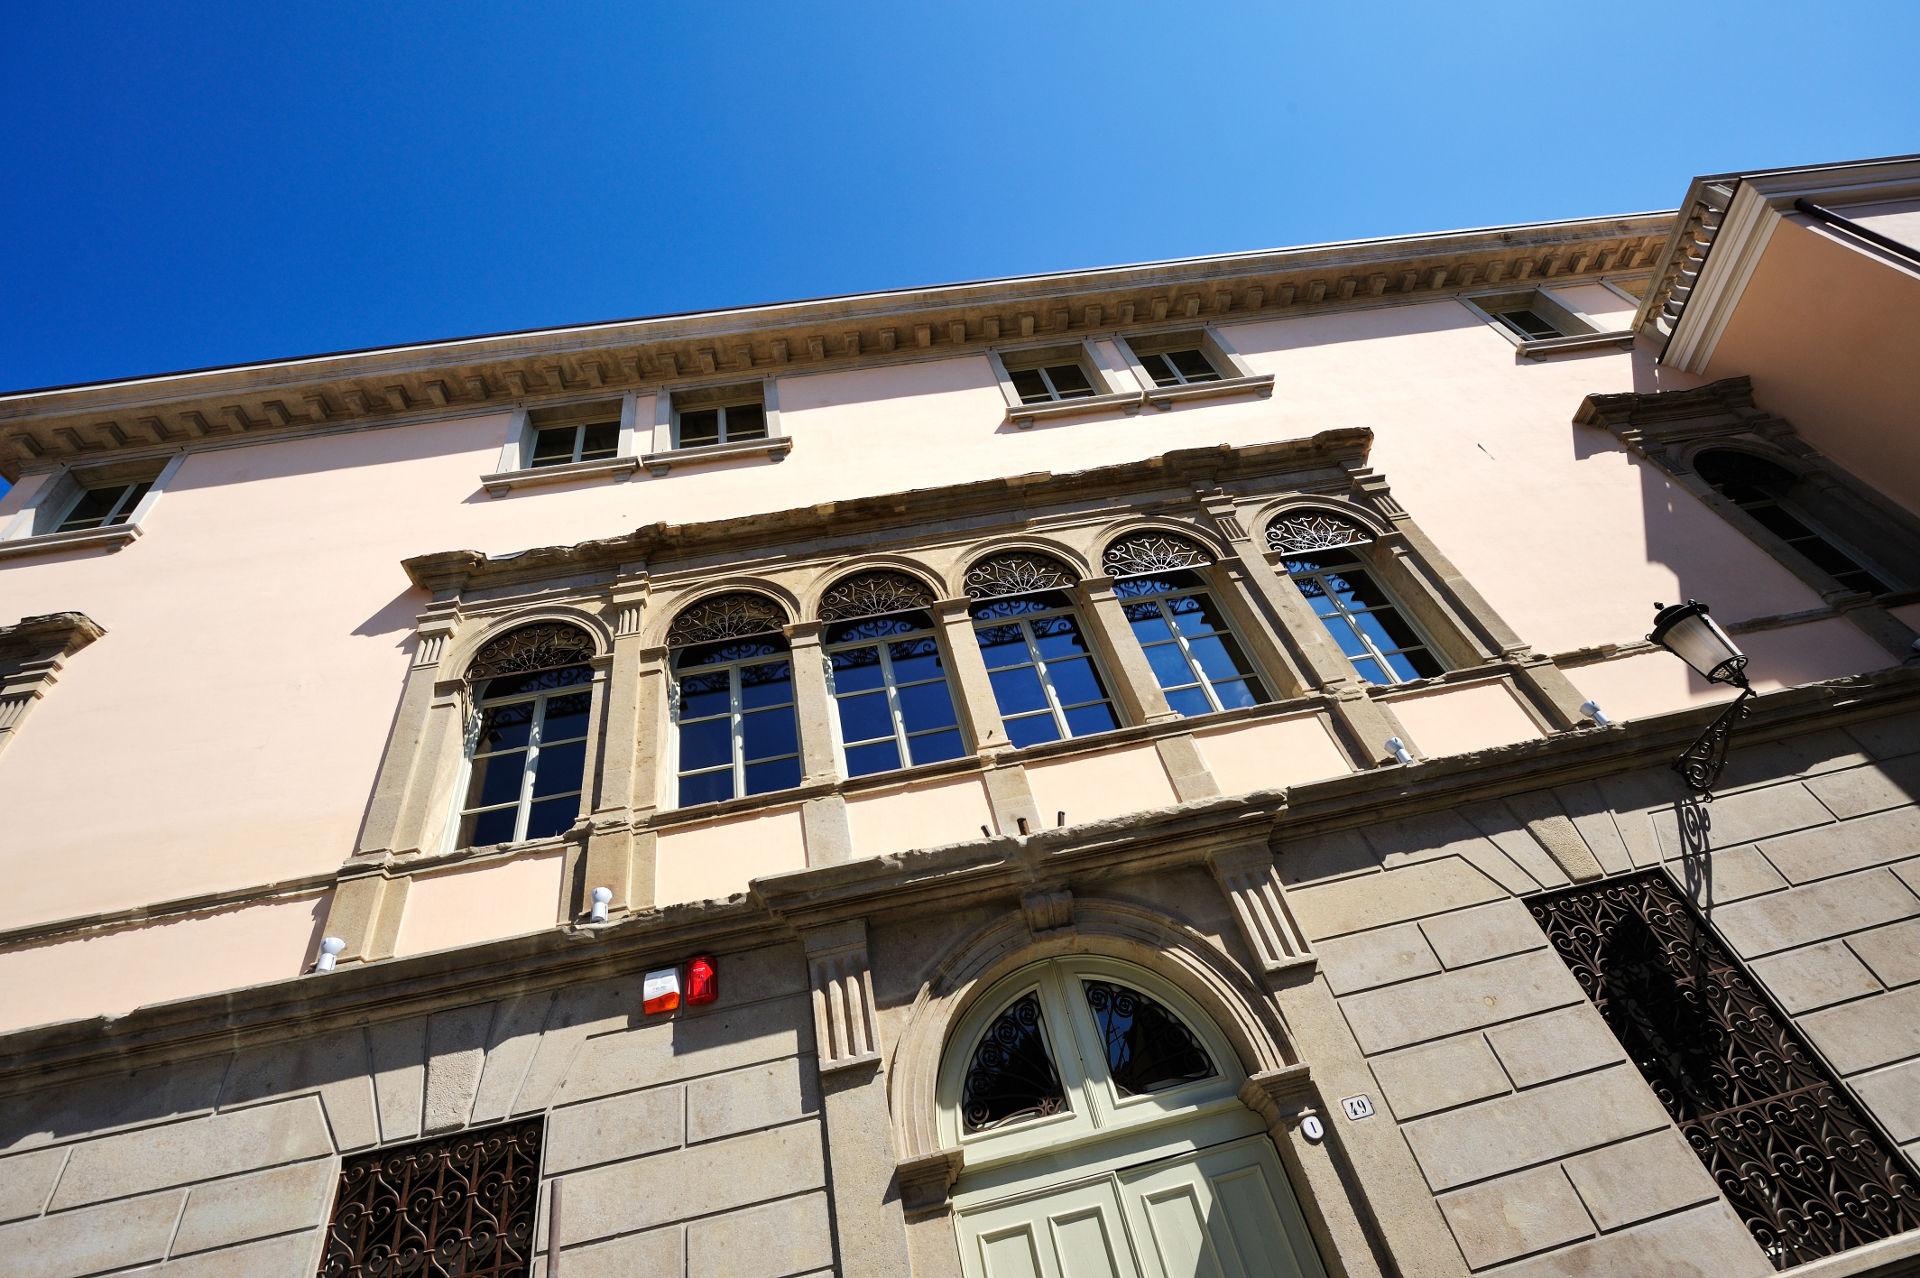 Palazzo Dondi dall'Orologio - image 6